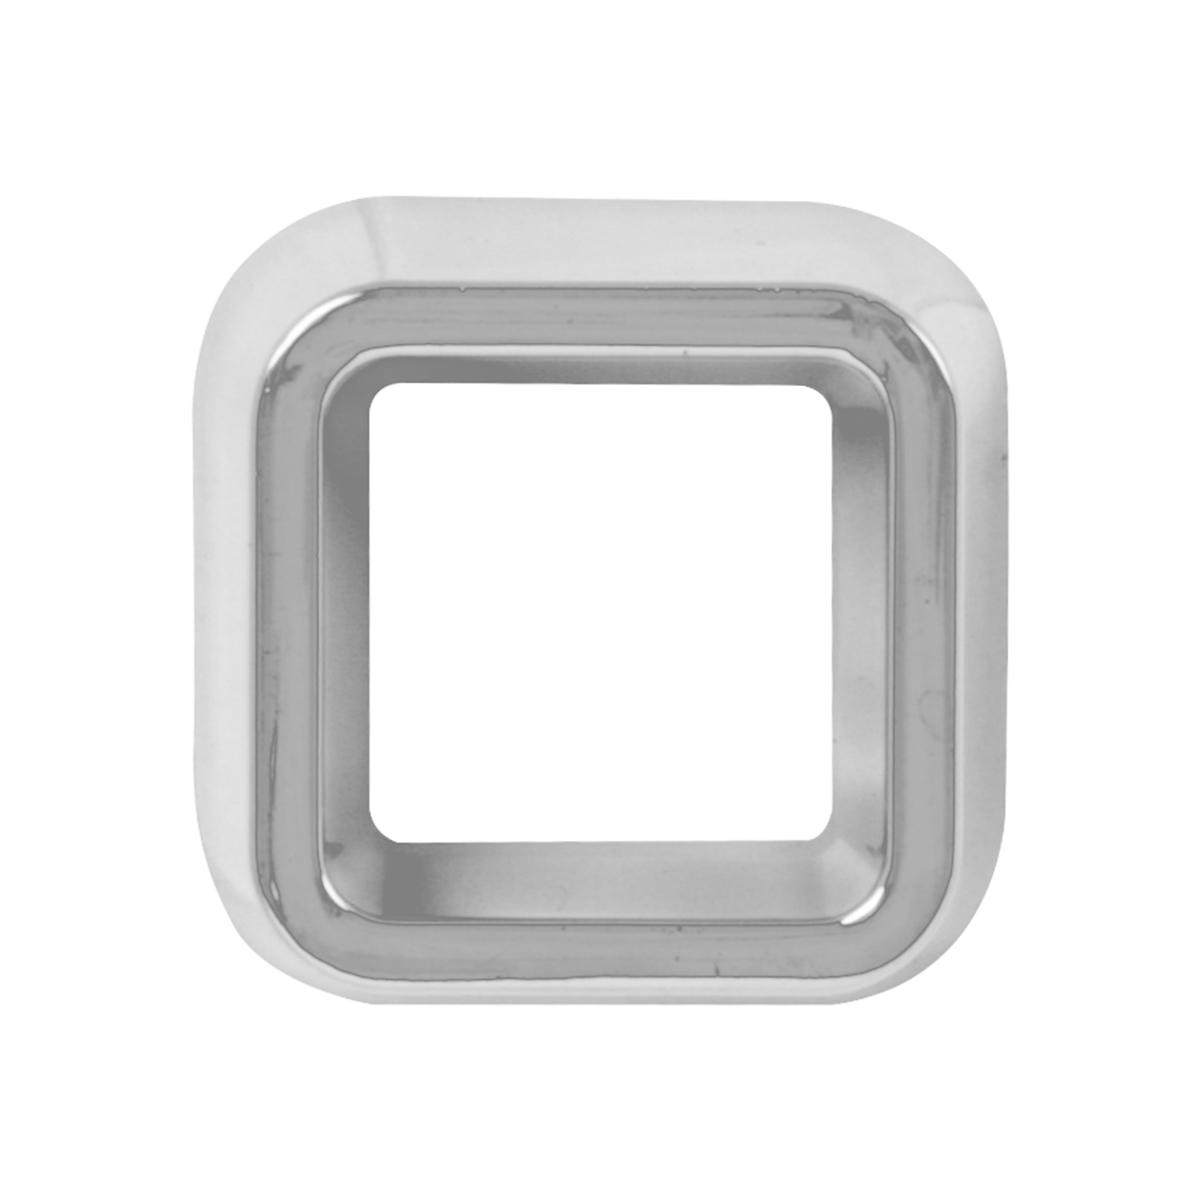 68240 KW Chrome Plastic Turn Signal Bezel